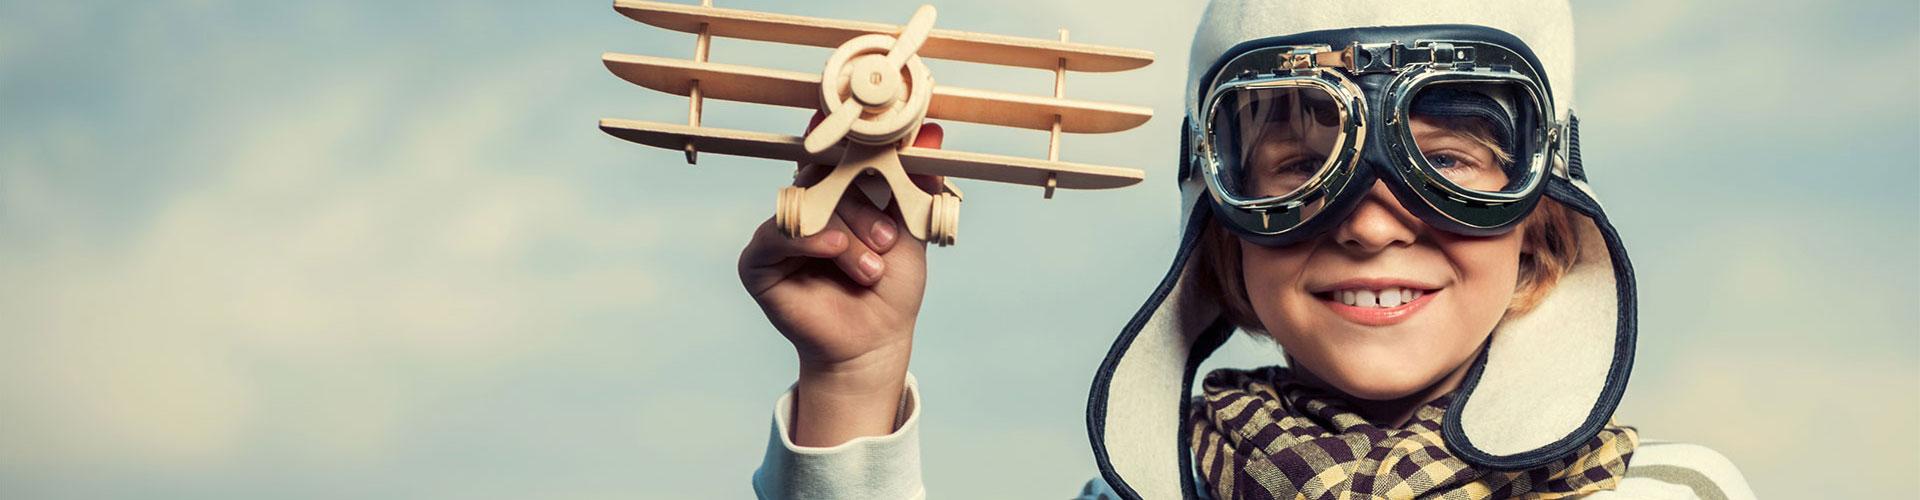 Fluggenuss | Flugangst bekämpfen - Hypnose gegen Flugangst